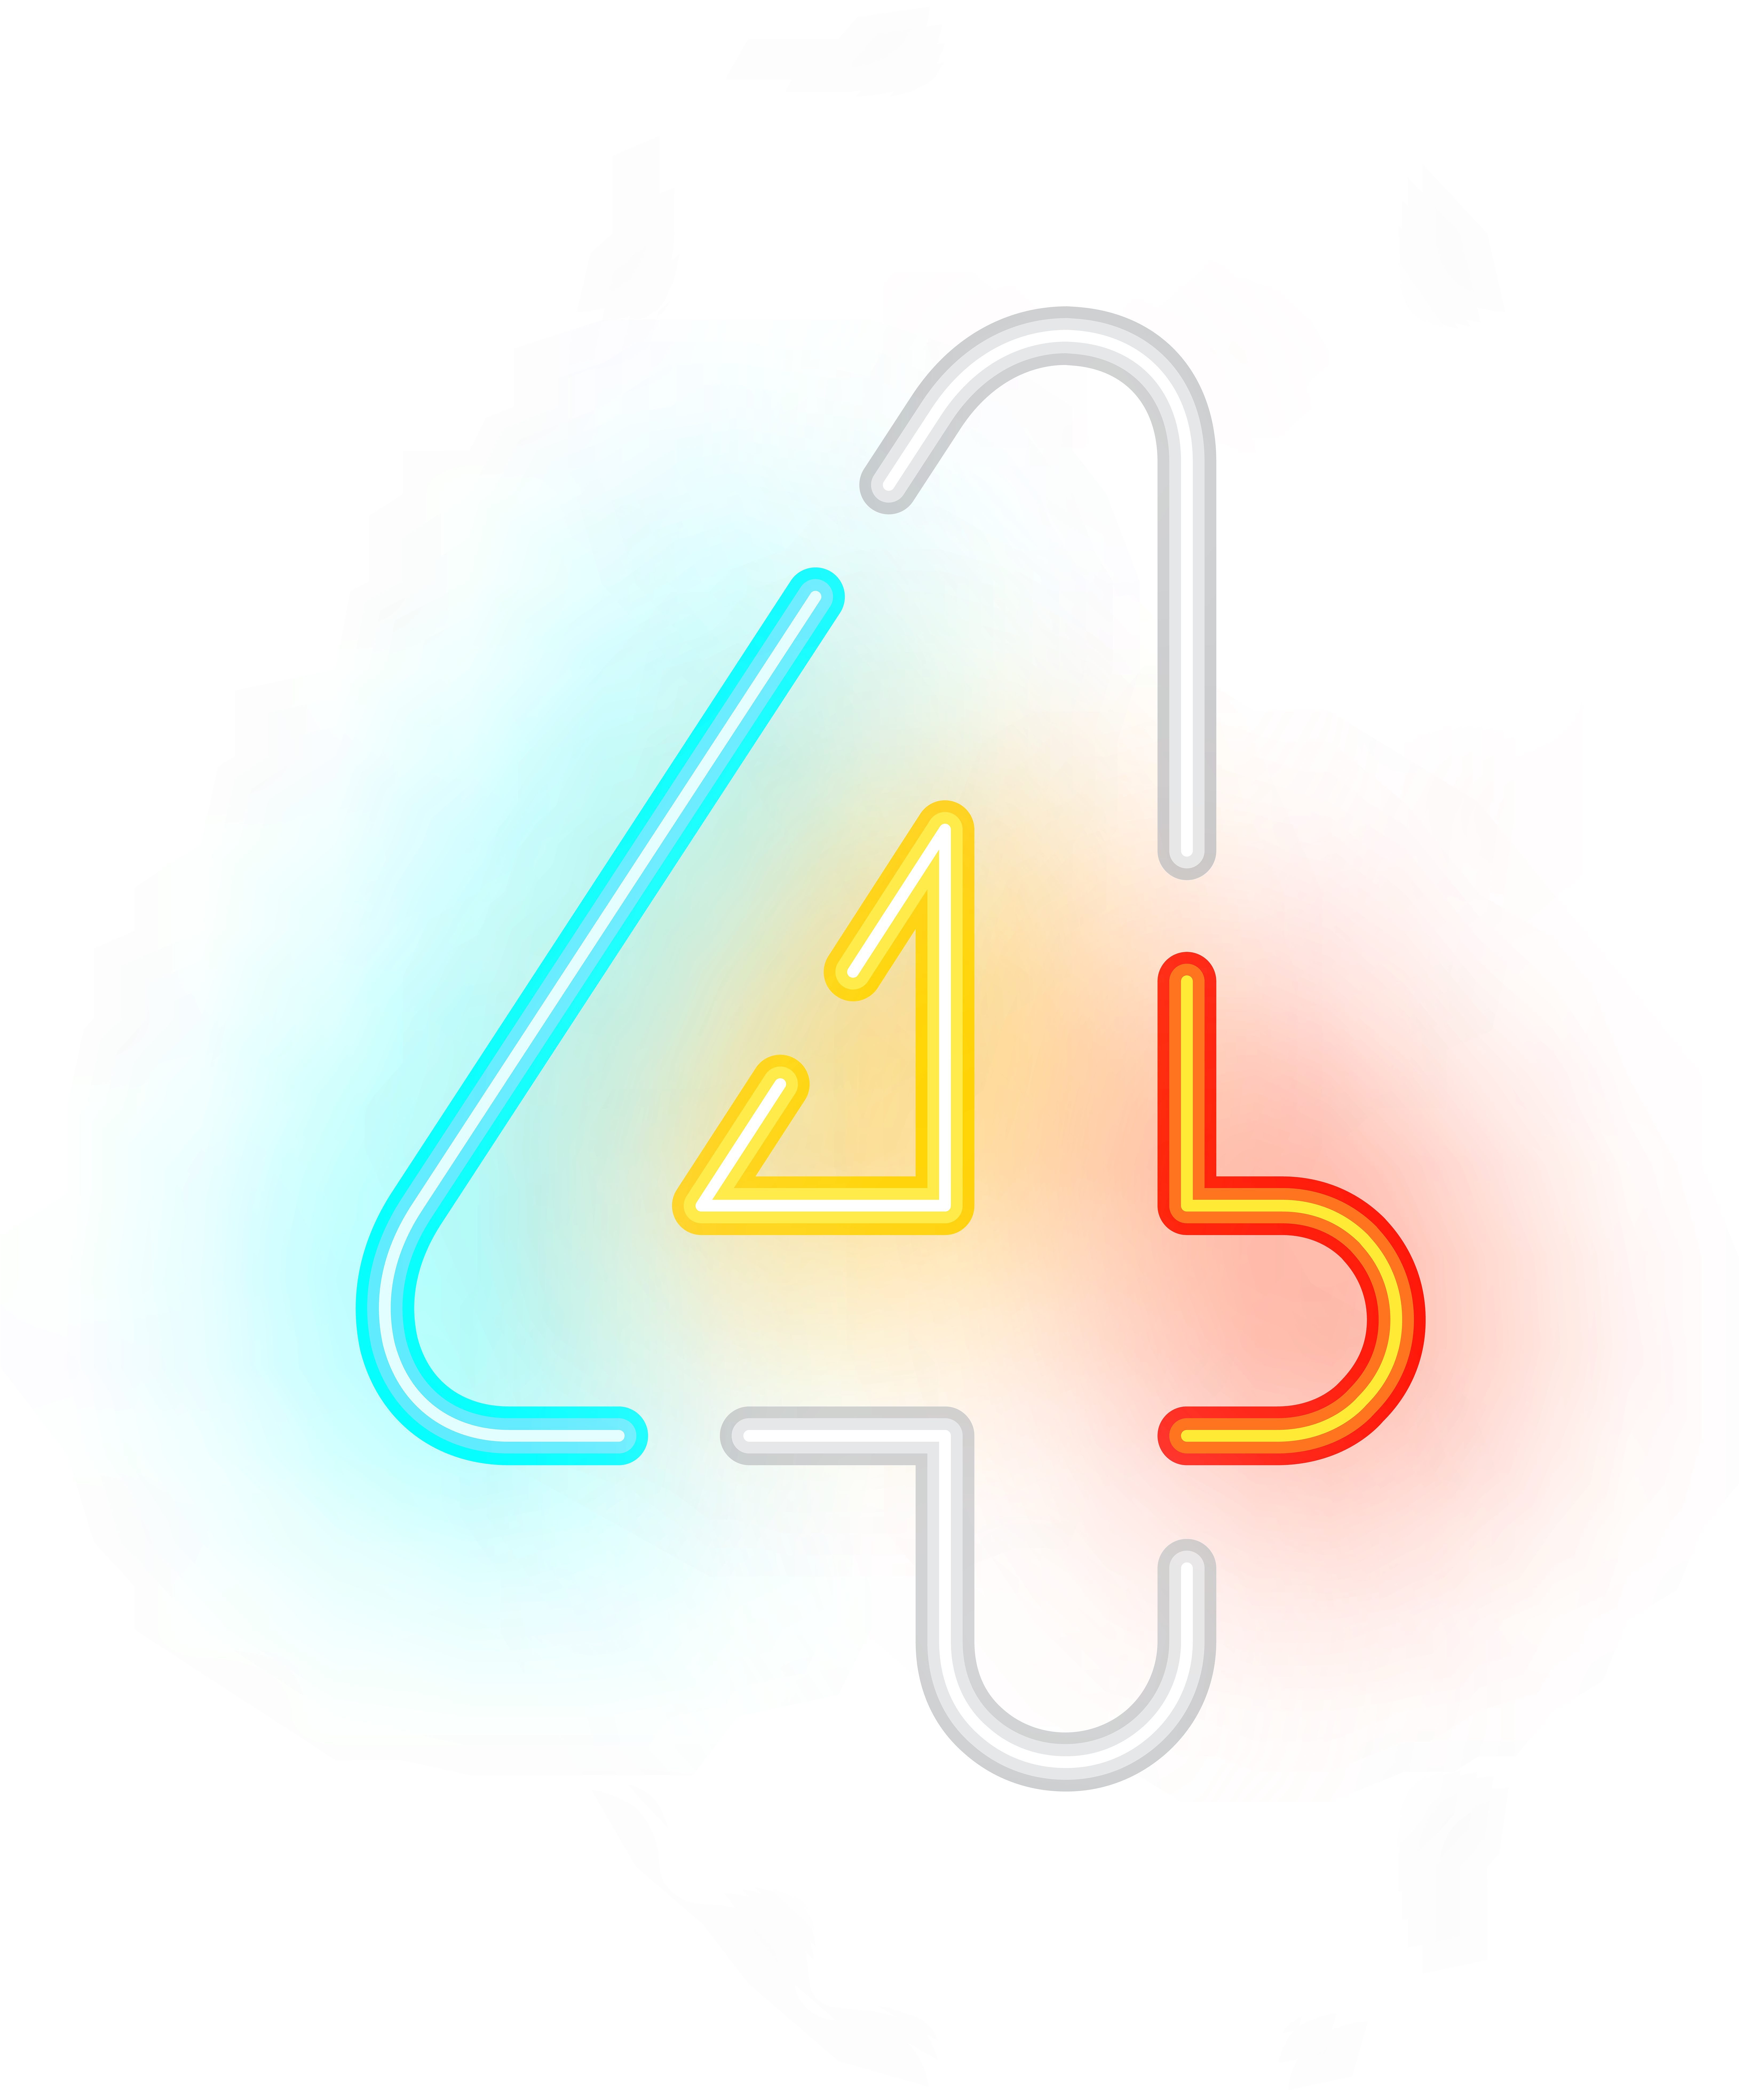 Transparent number sign clipart - Transparent Neon Clipart